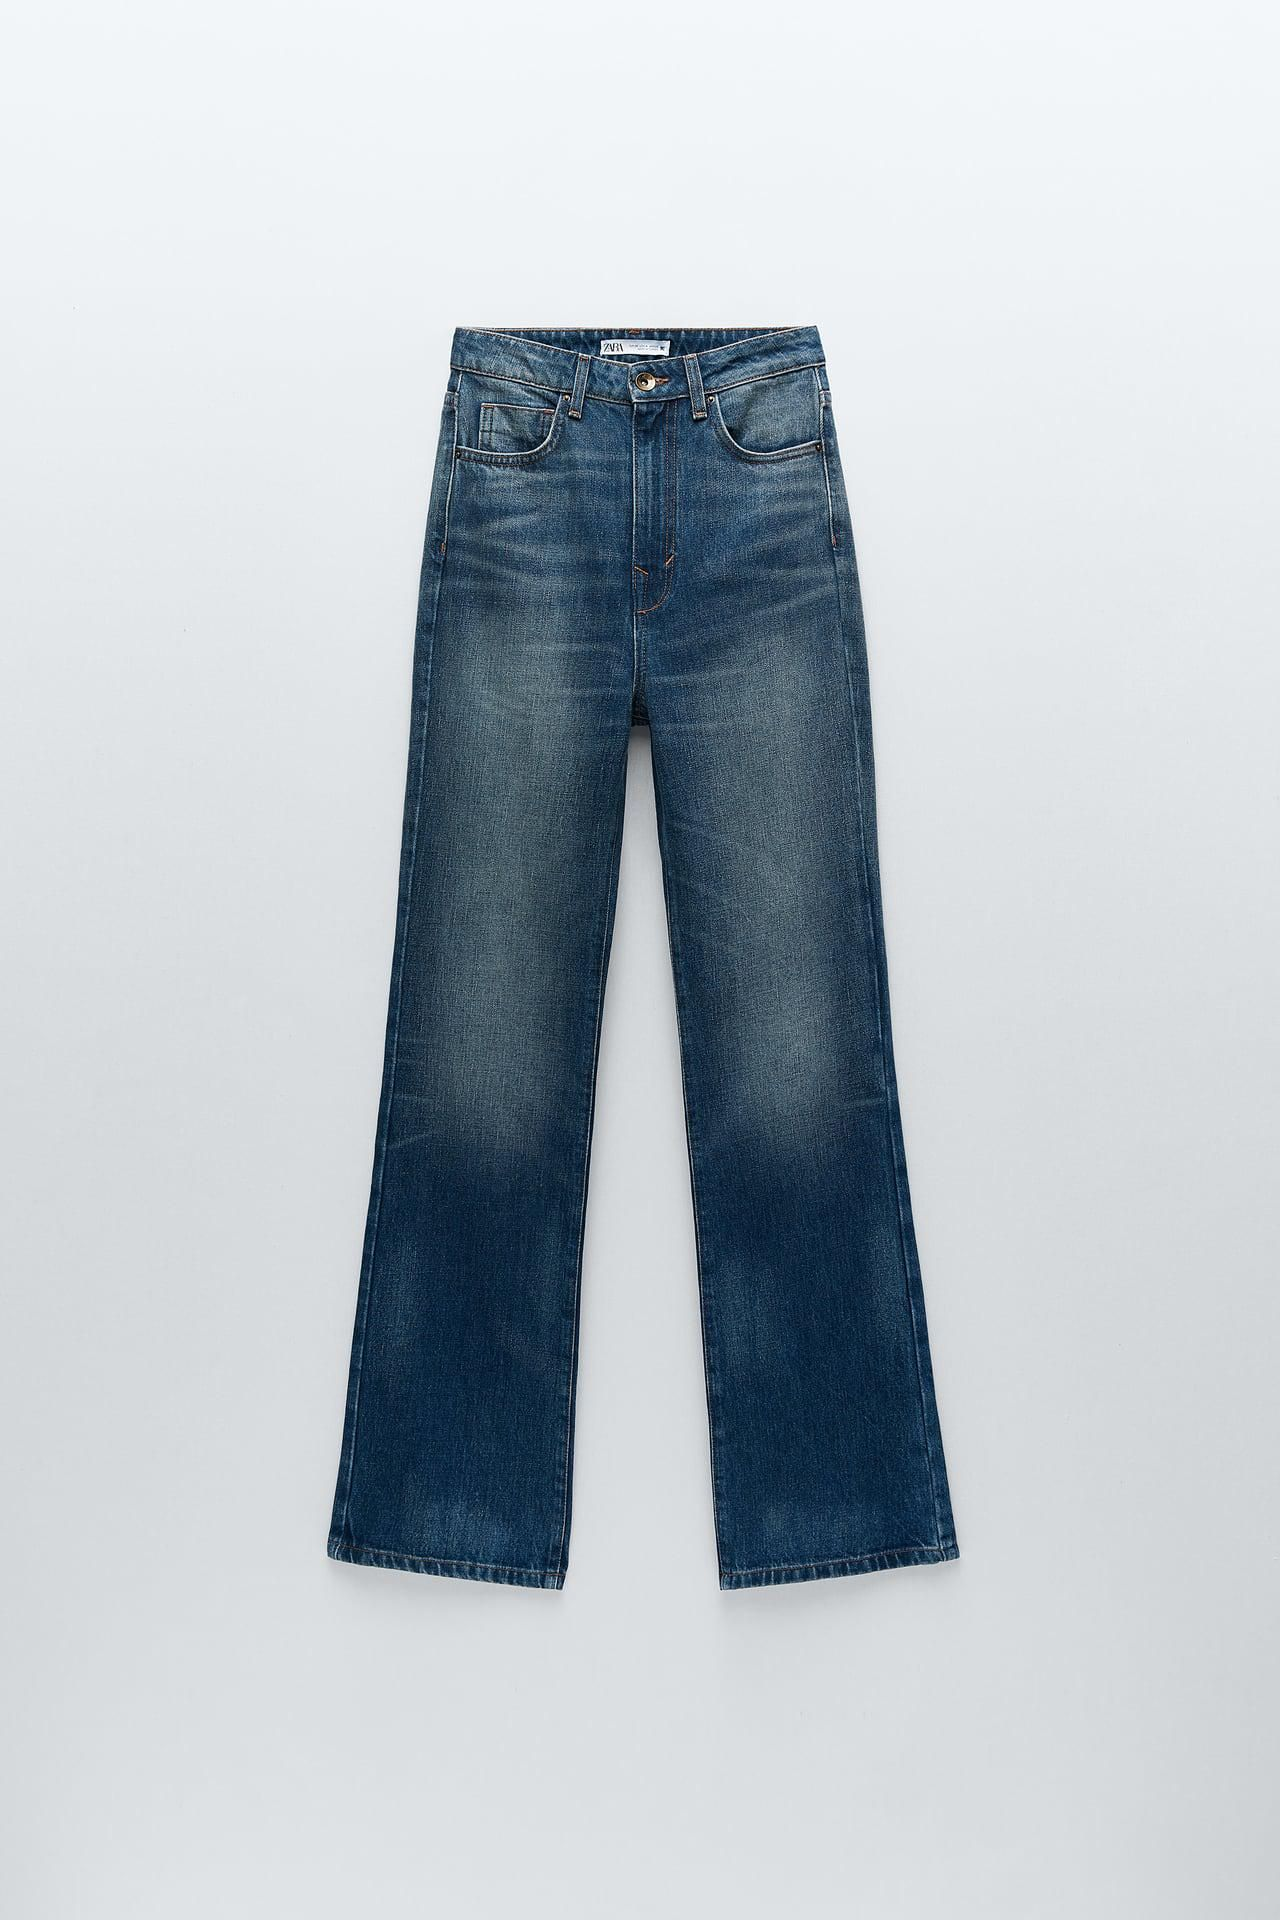 Hi-Rise Bootcut 70s Z1975 Jeans